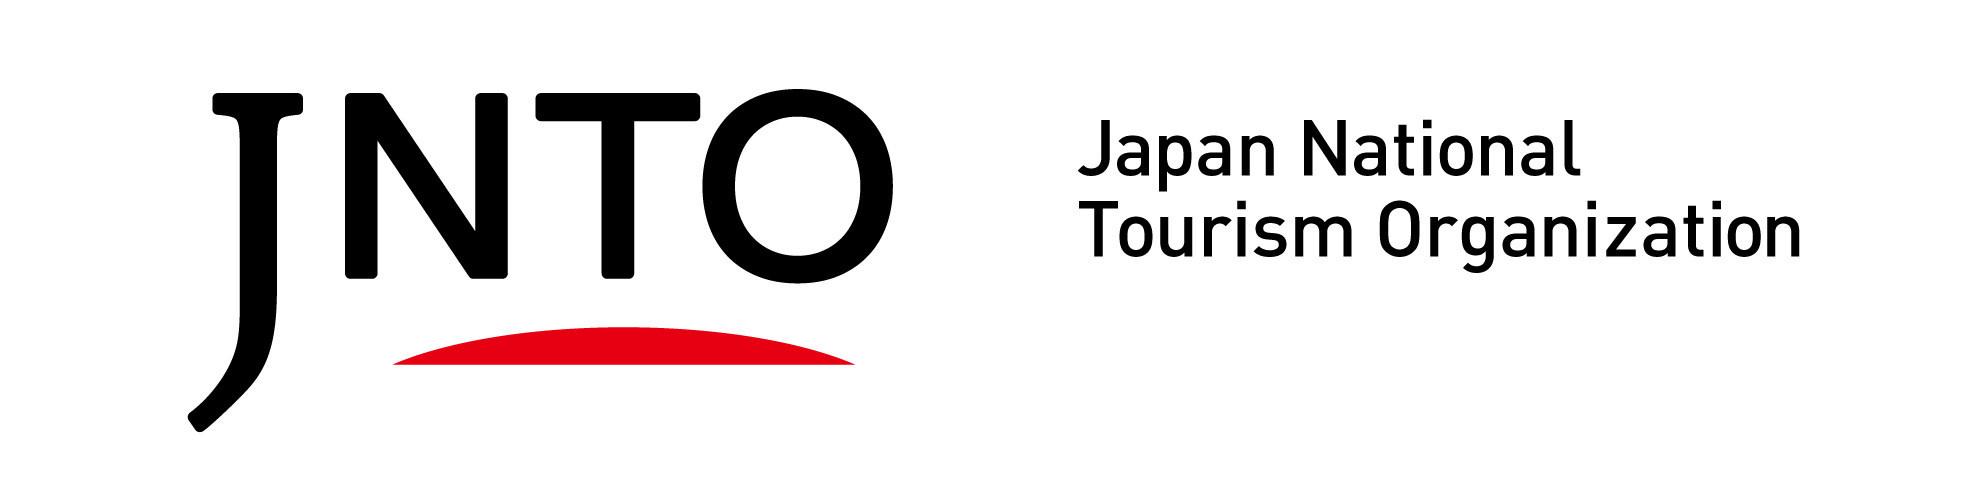 (PRNewsfoto/Japan National Tourism Organiza)